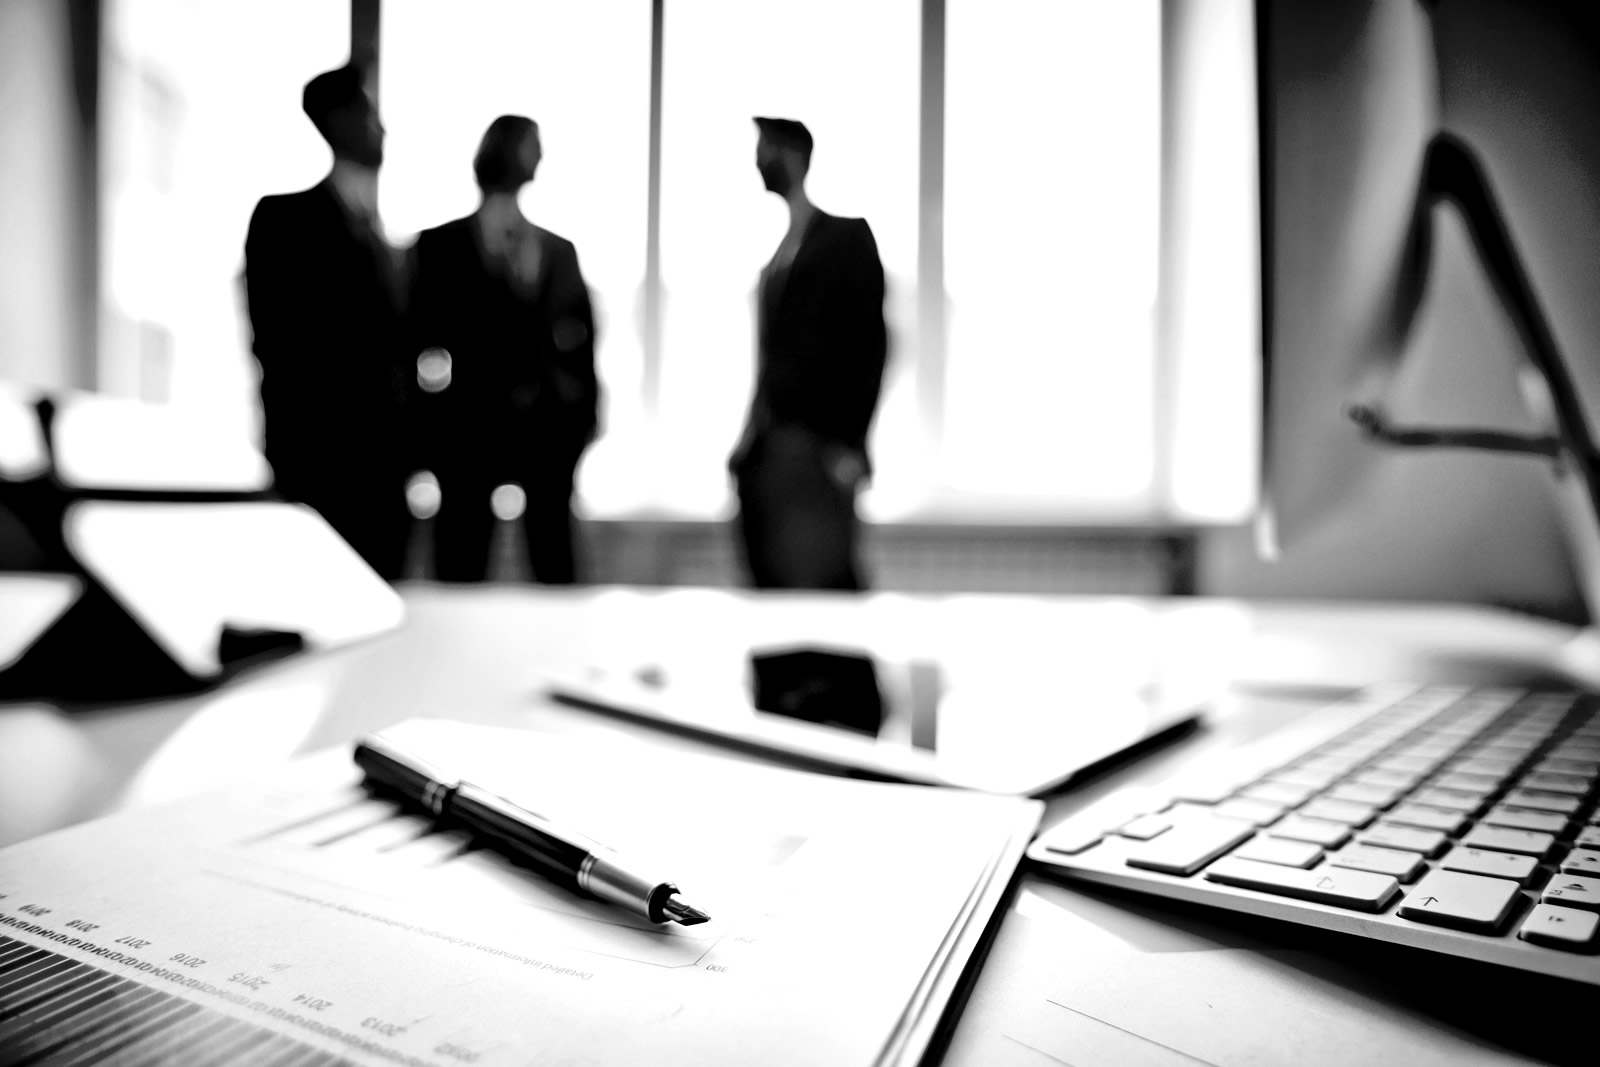 Business Partnerships, Meetings, Faciliation, Brainstorm